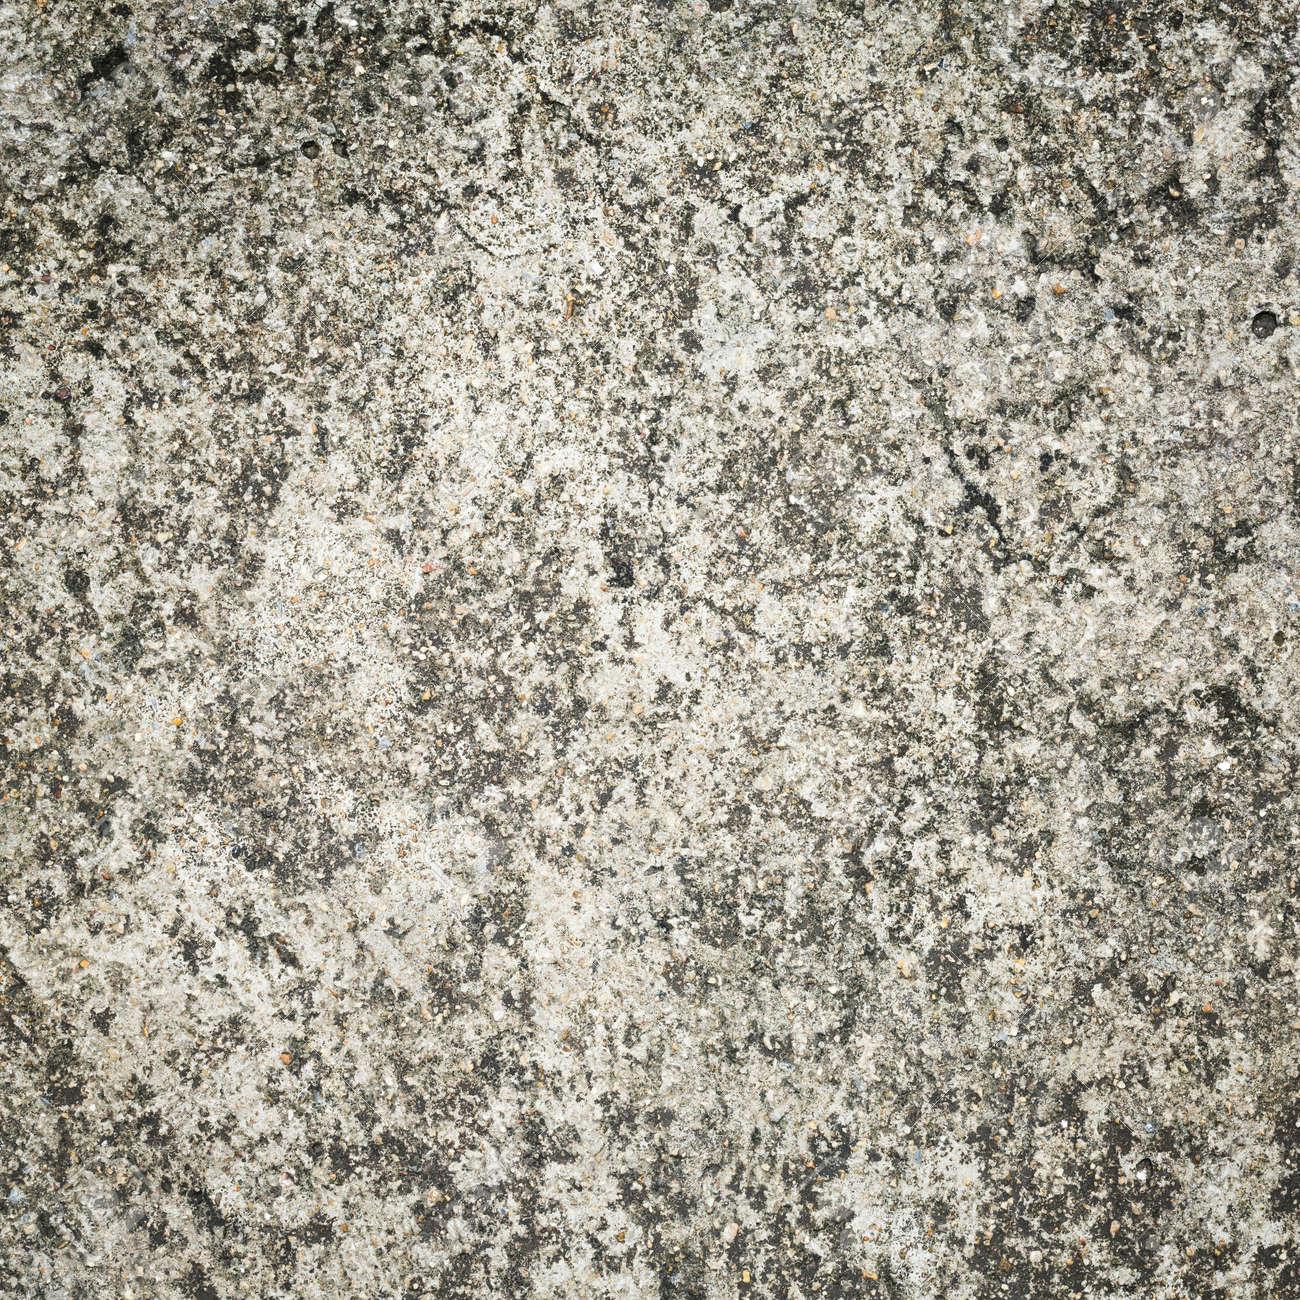 dirty concrete floor texture. Wonderful Concrete Close Up Old And Dirty Concrete Floor Texture Stock Photo  30606026 For Dirty Concrete Floor Texture